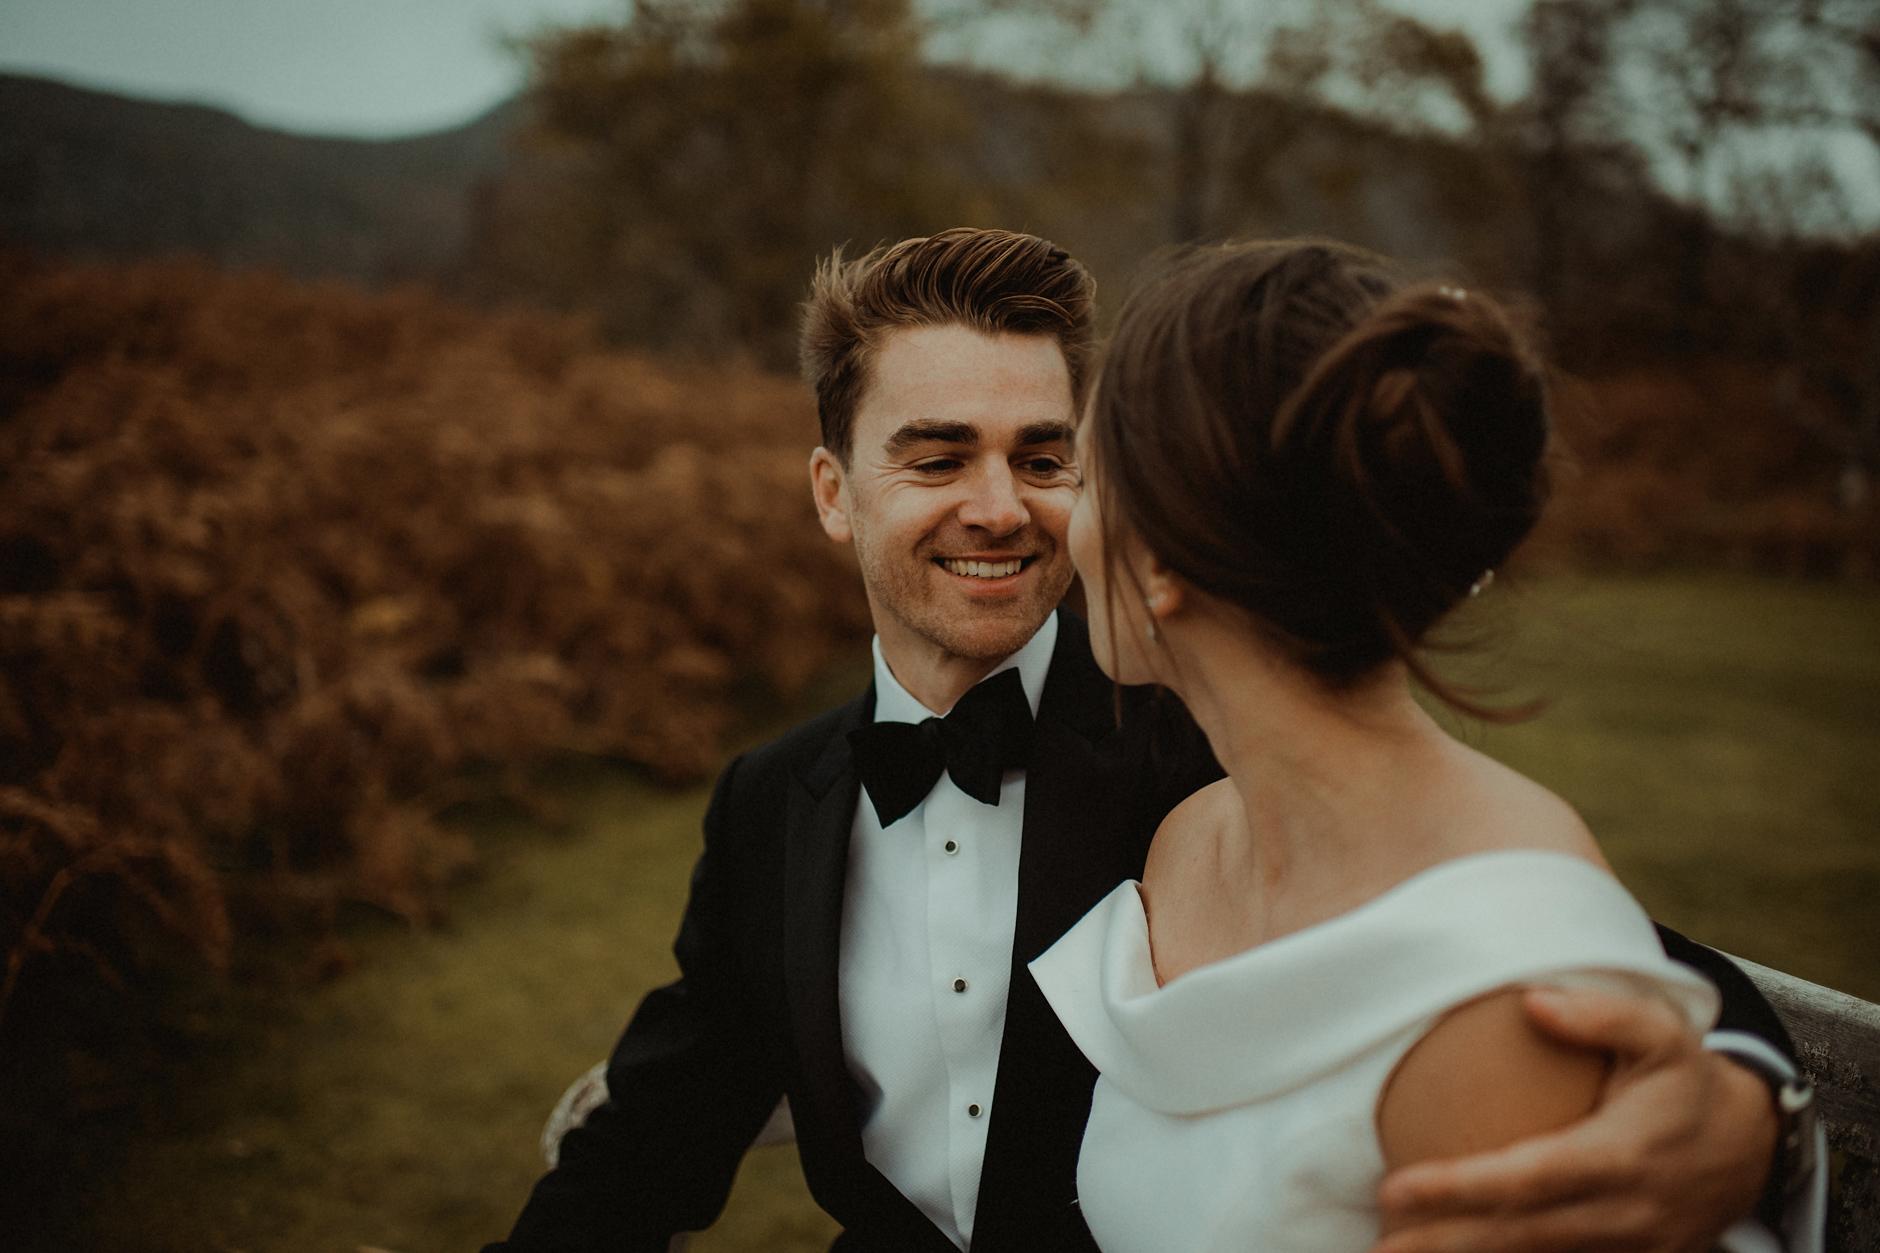 Glentruim-Wedding-Nikki-Leadbetter-Photography-191.jpg